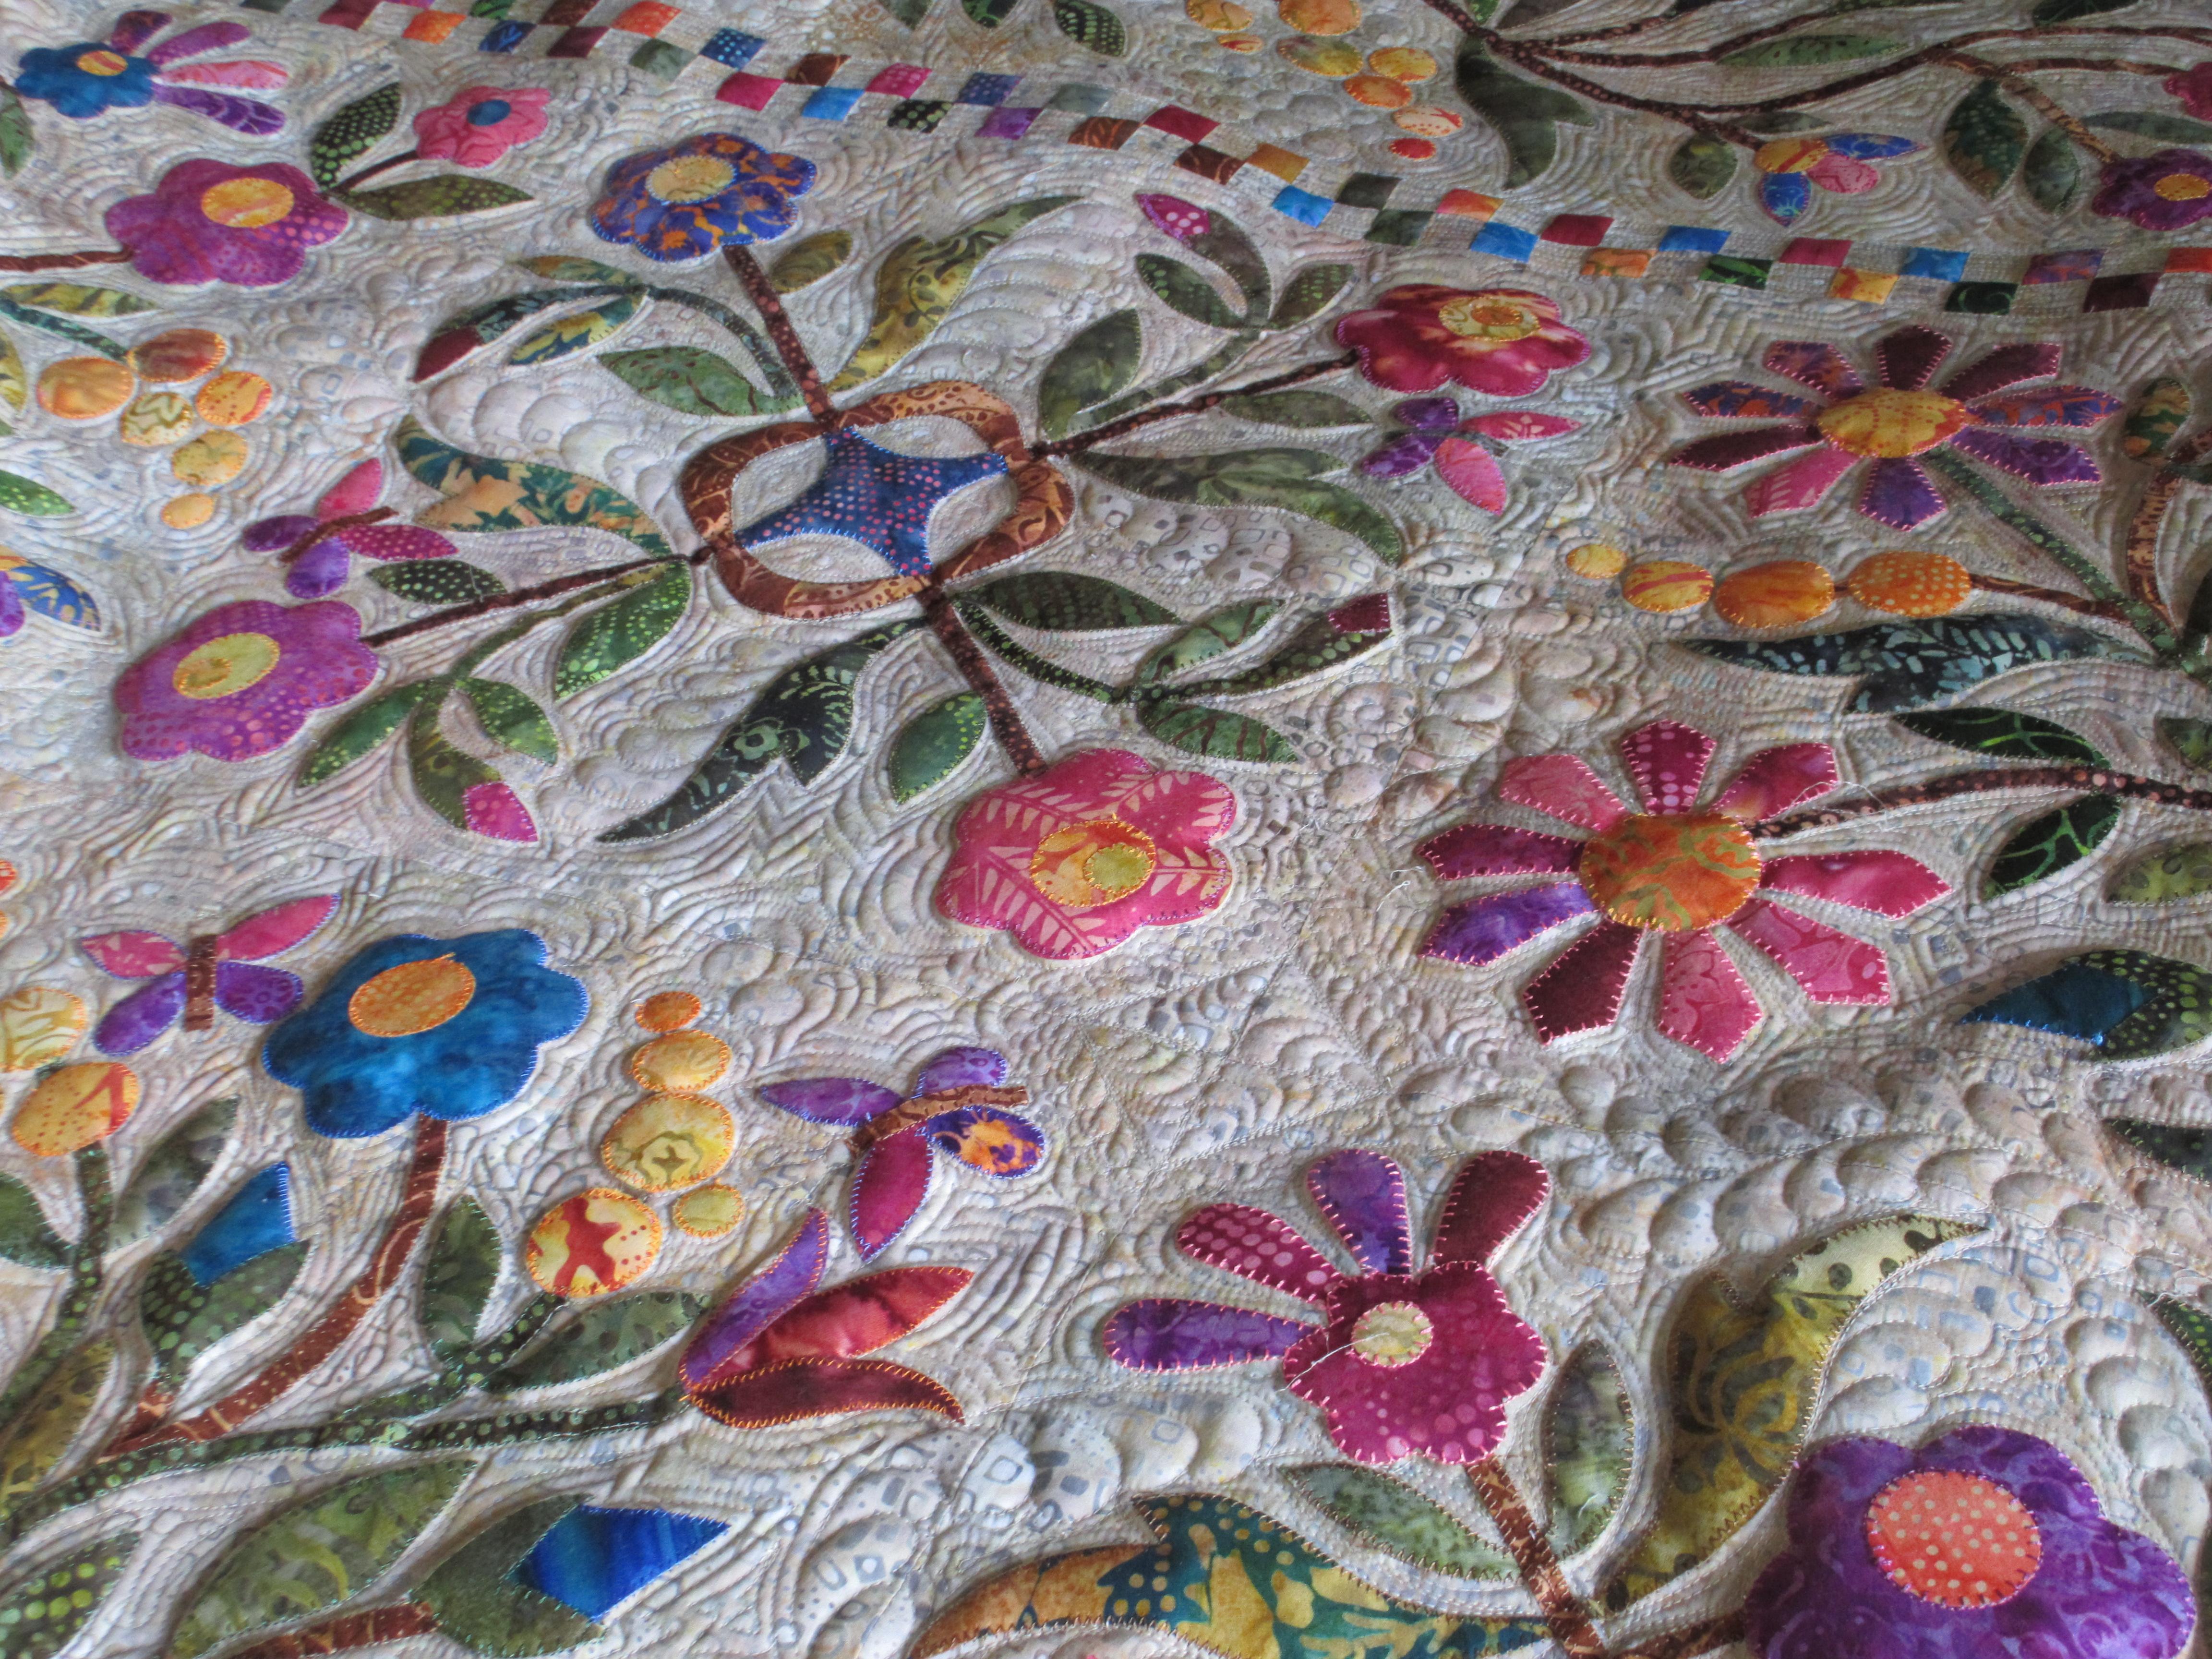 Edyta Sitar Cowtown Quilts